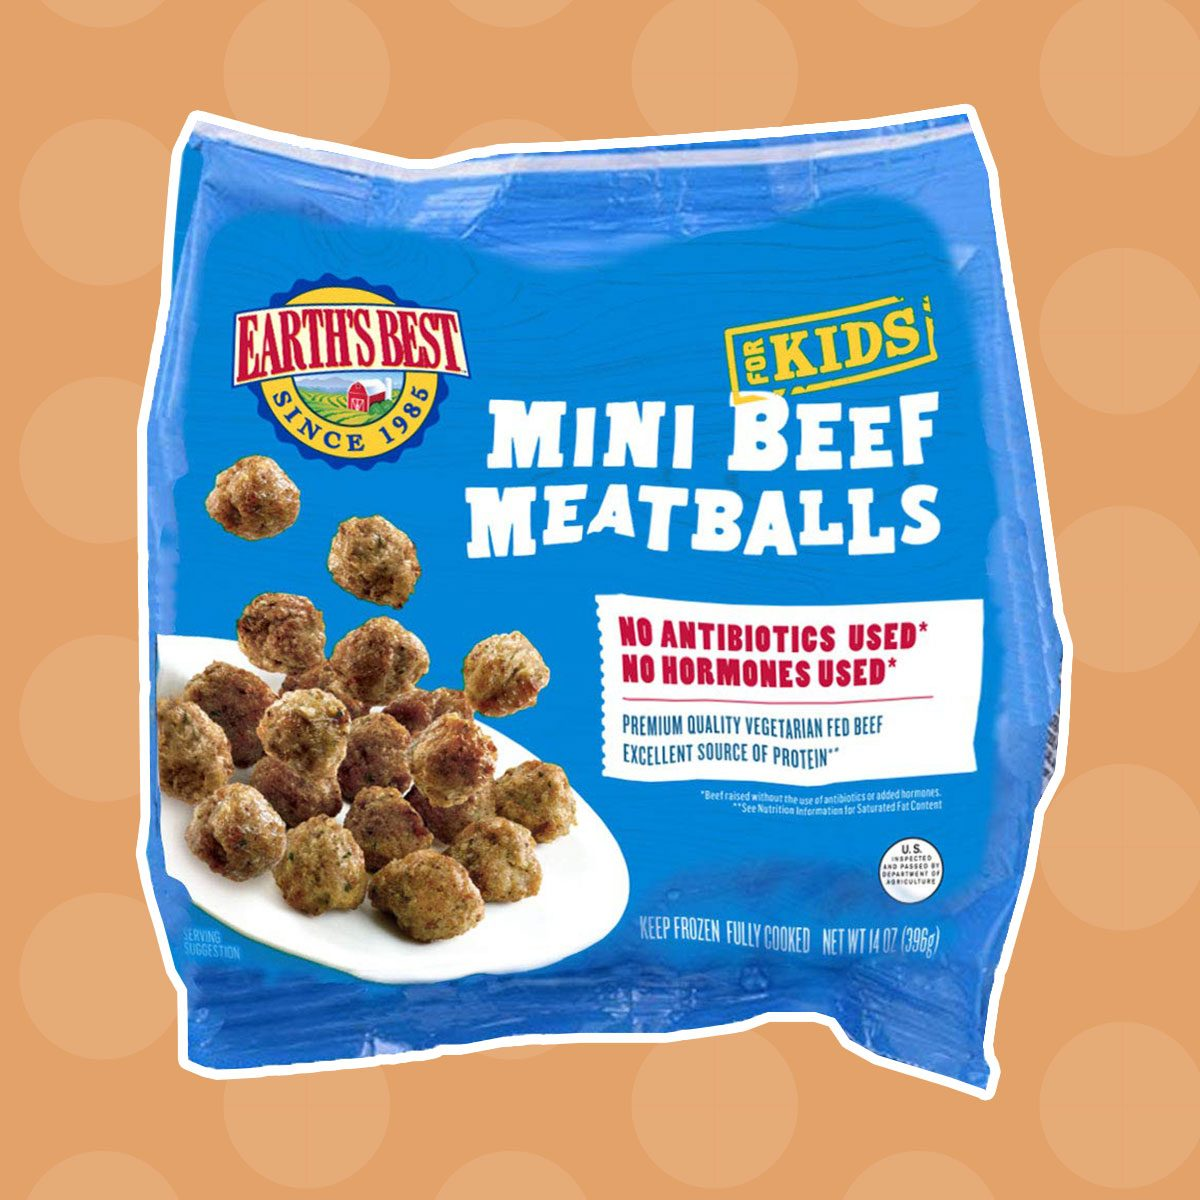 Mini Beef Meatballs